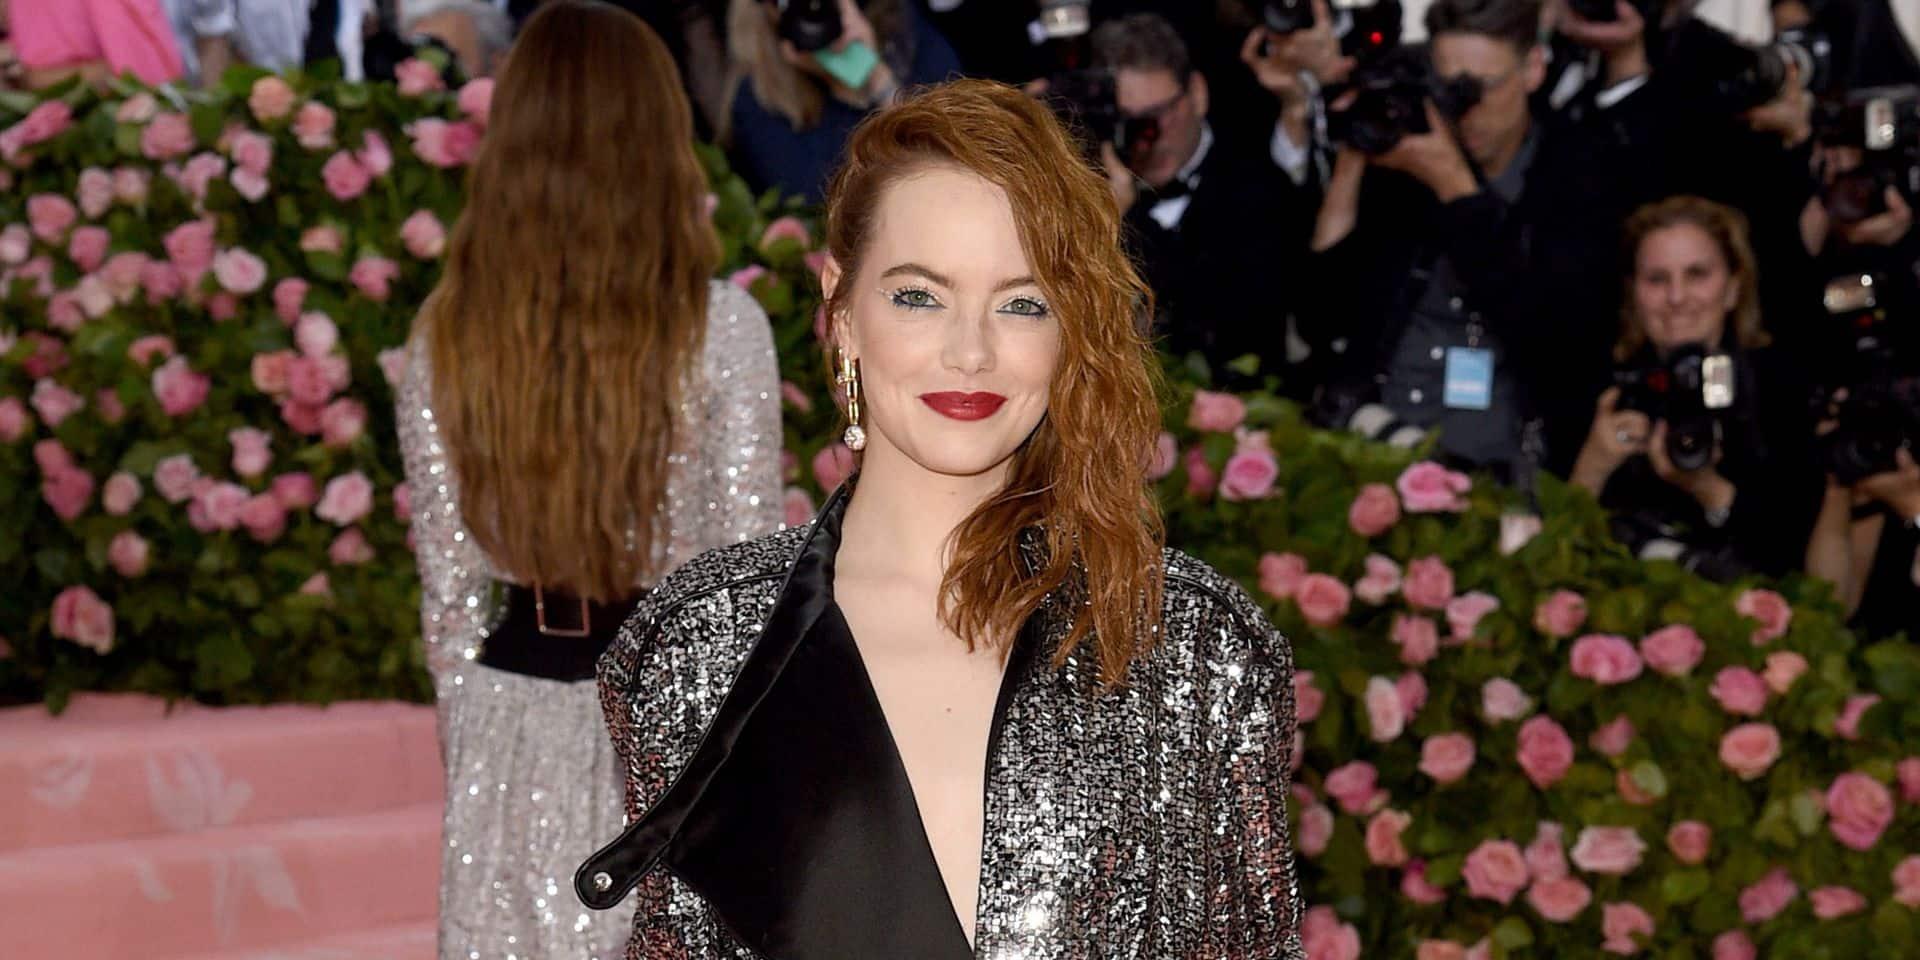 Emma Stone, qui doit tourner dans le prochain film Disney, chute et se blesse